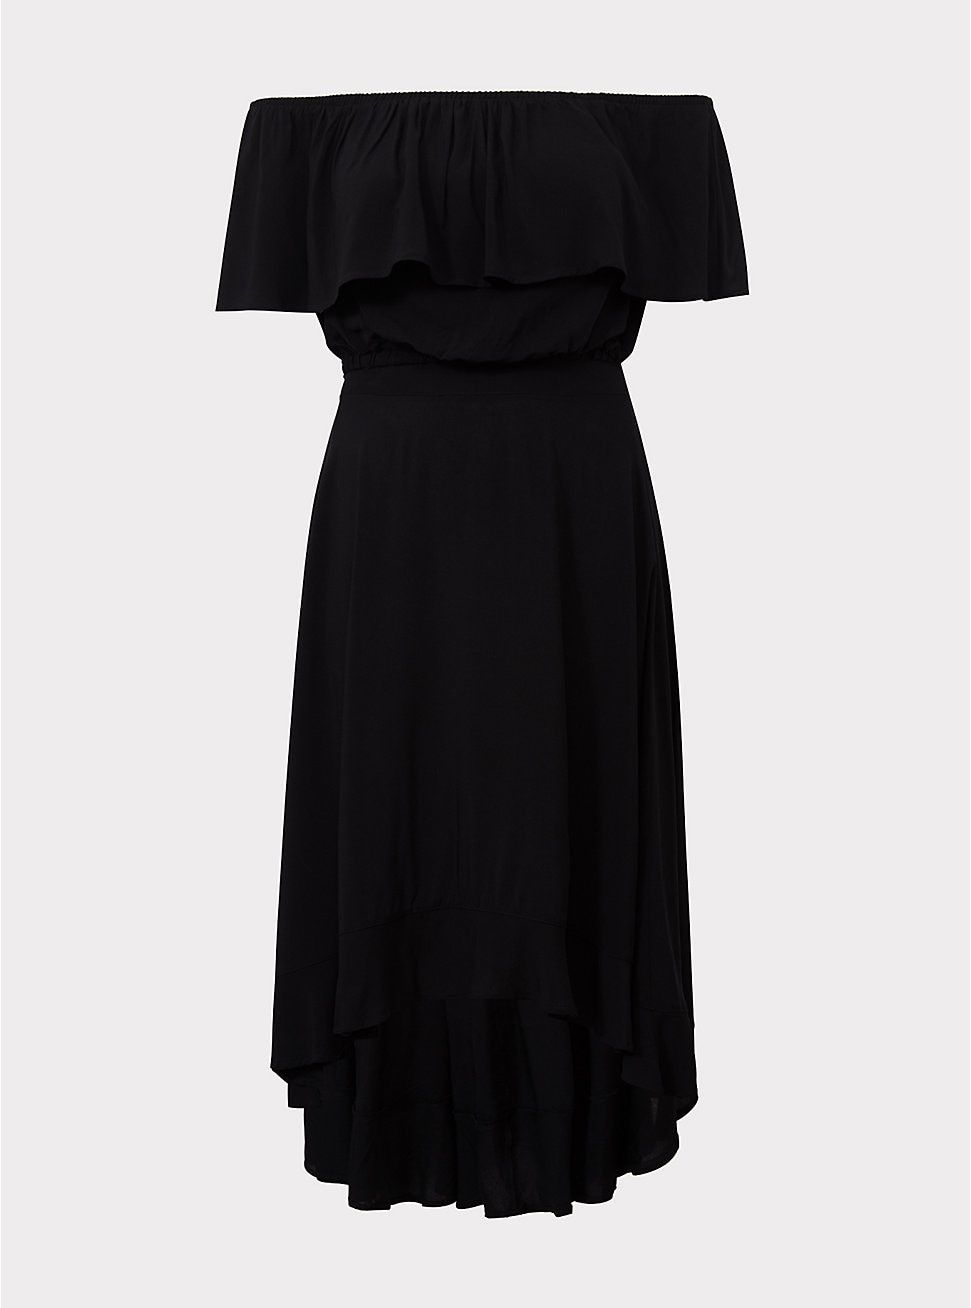 741b9fff481 Black Challis Off Shoulder   Ruffle Skirt 2-Piece Set in 2019